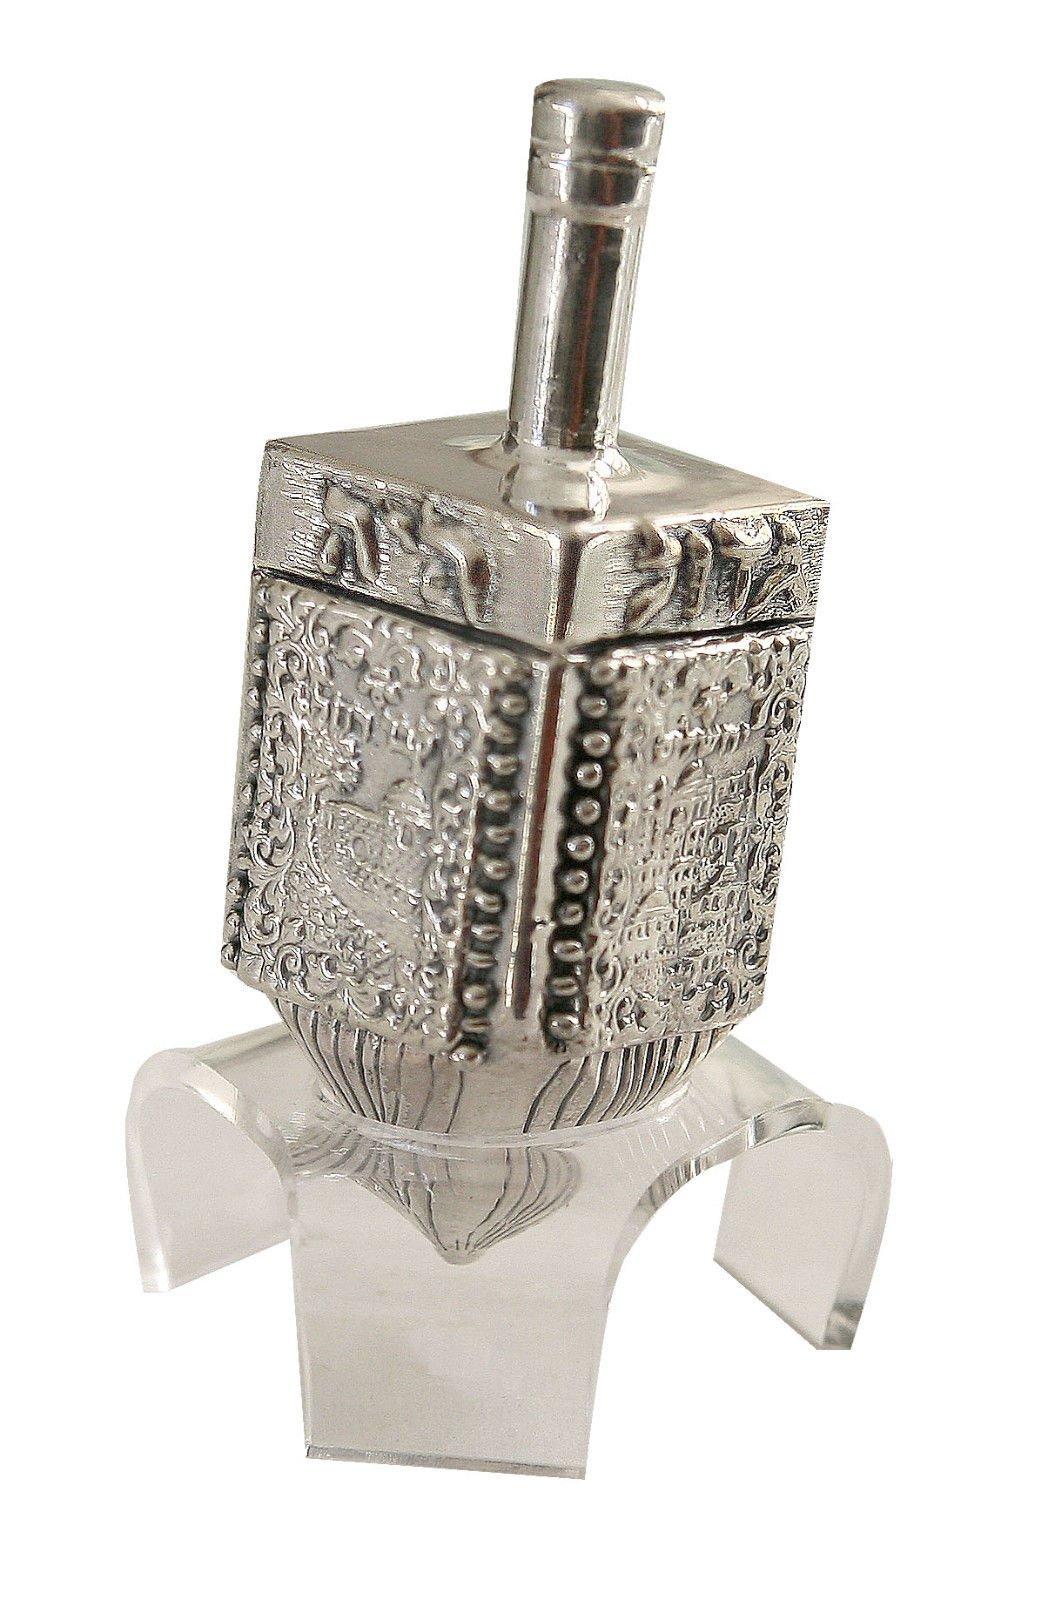 Hanukkah Chanukka Big Dreidel 925 Sterling Silver, Old Jerusalem Skyline Hand Made Size: 4.0'' x 1.25'' Stand Optional by Judaica (Image #2)